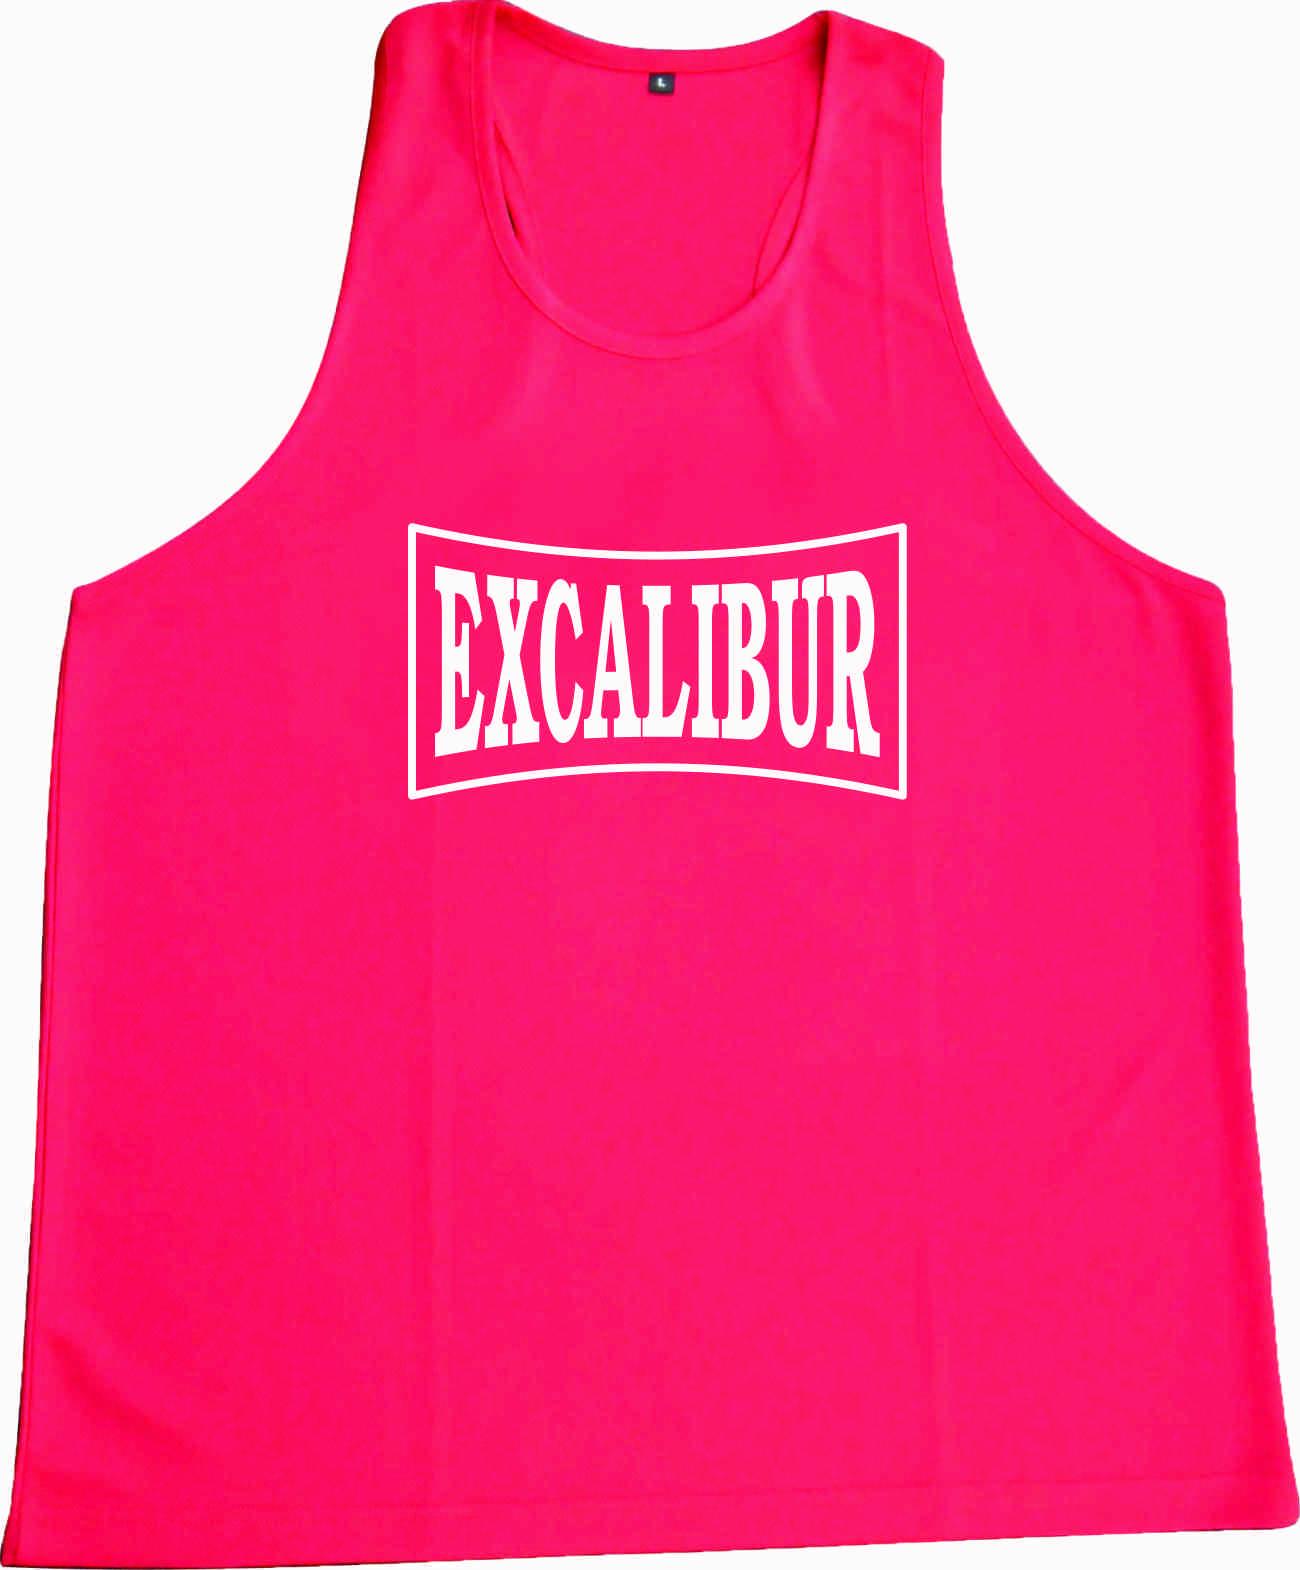 Майка Excalibur 1432-Red<br>Вес кг: 250.00000000;